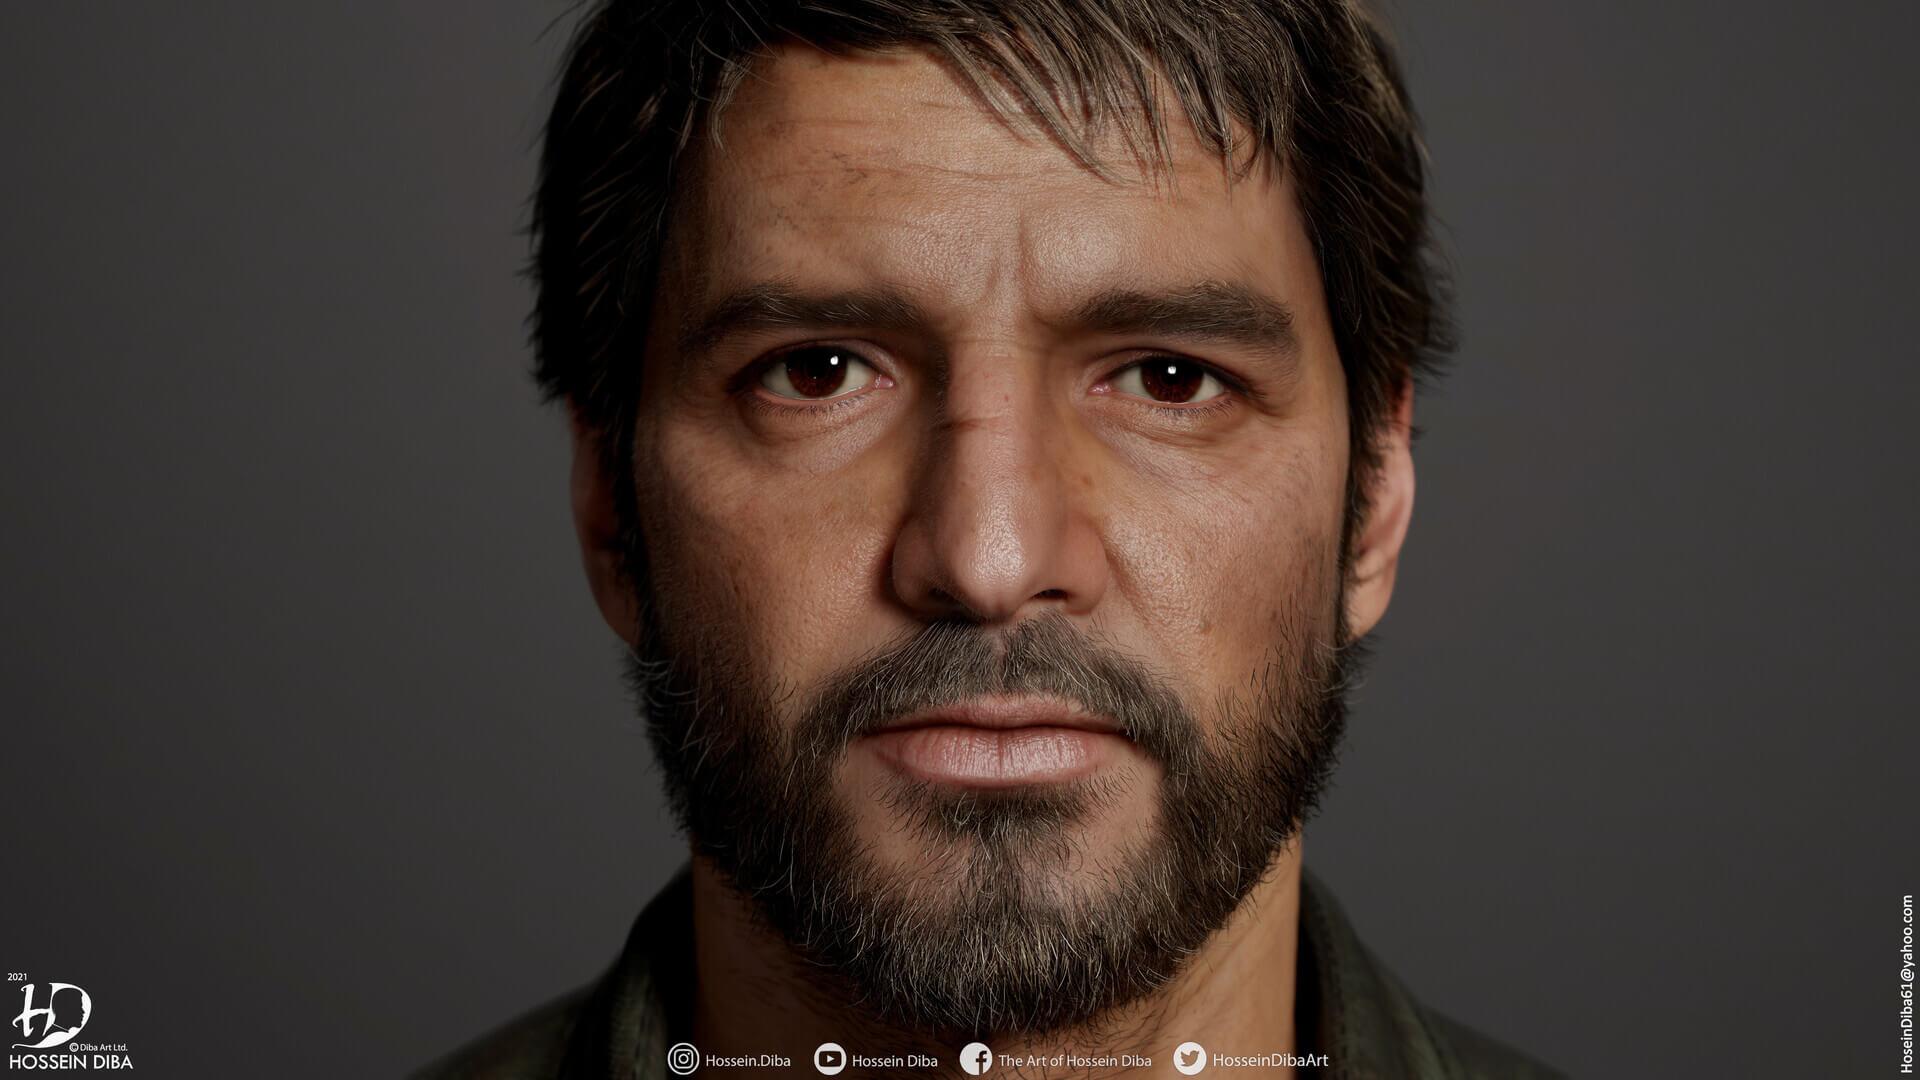 The Last of Us: Un artista convierte a Pedro Pascal en Joel con estos espectaculares modelos en 3D